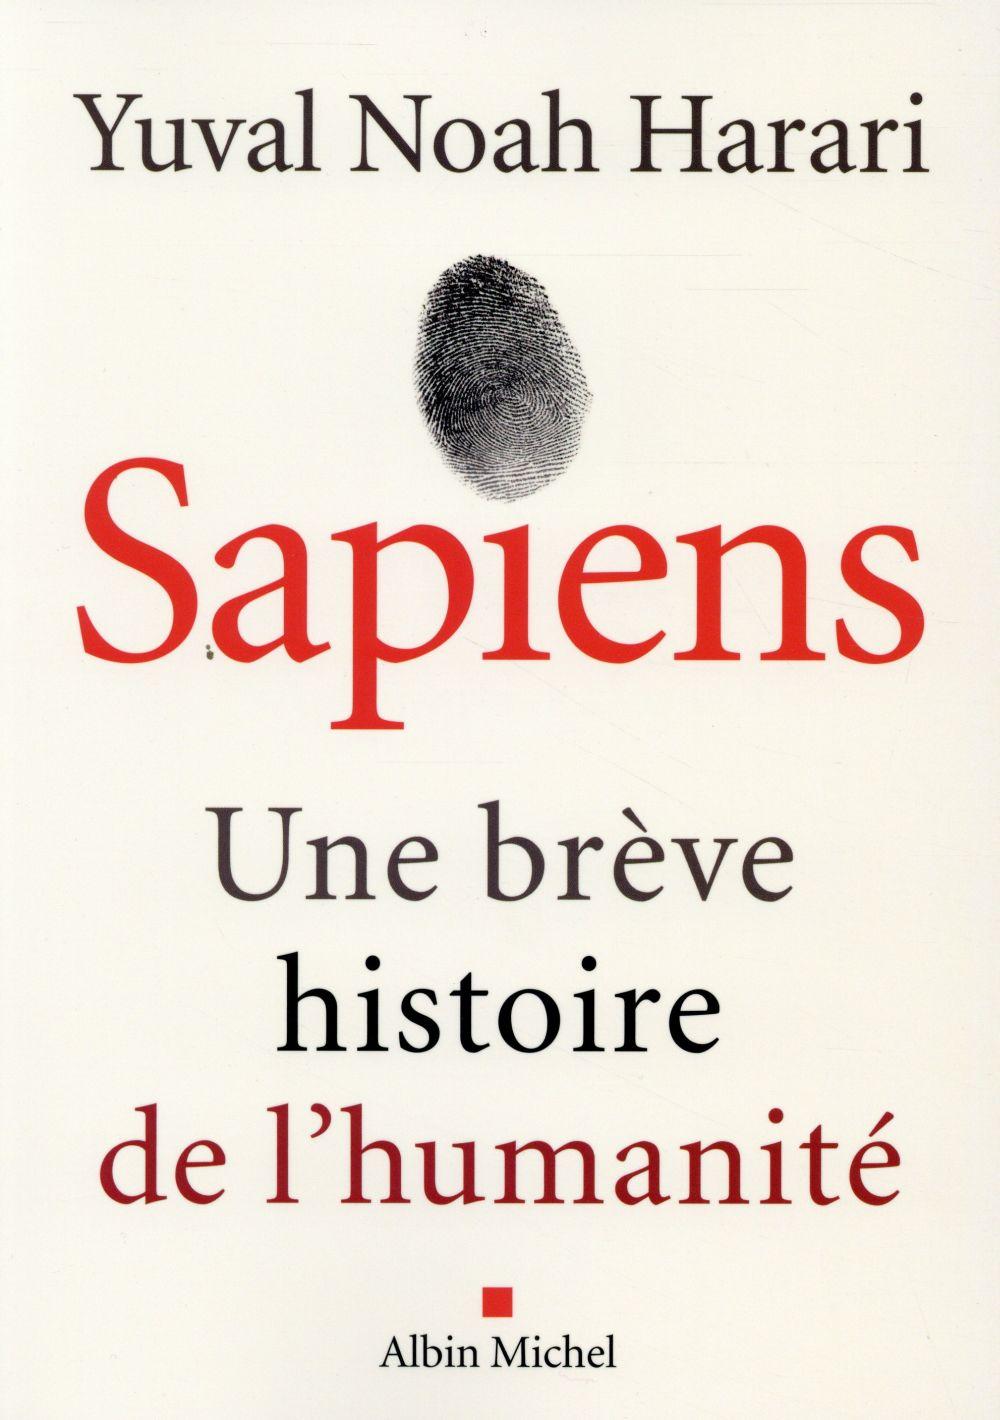 Harari Yuval Noah - SAPIENS  -  UNE BREVE HISTOIRE DE L'HUMANITE